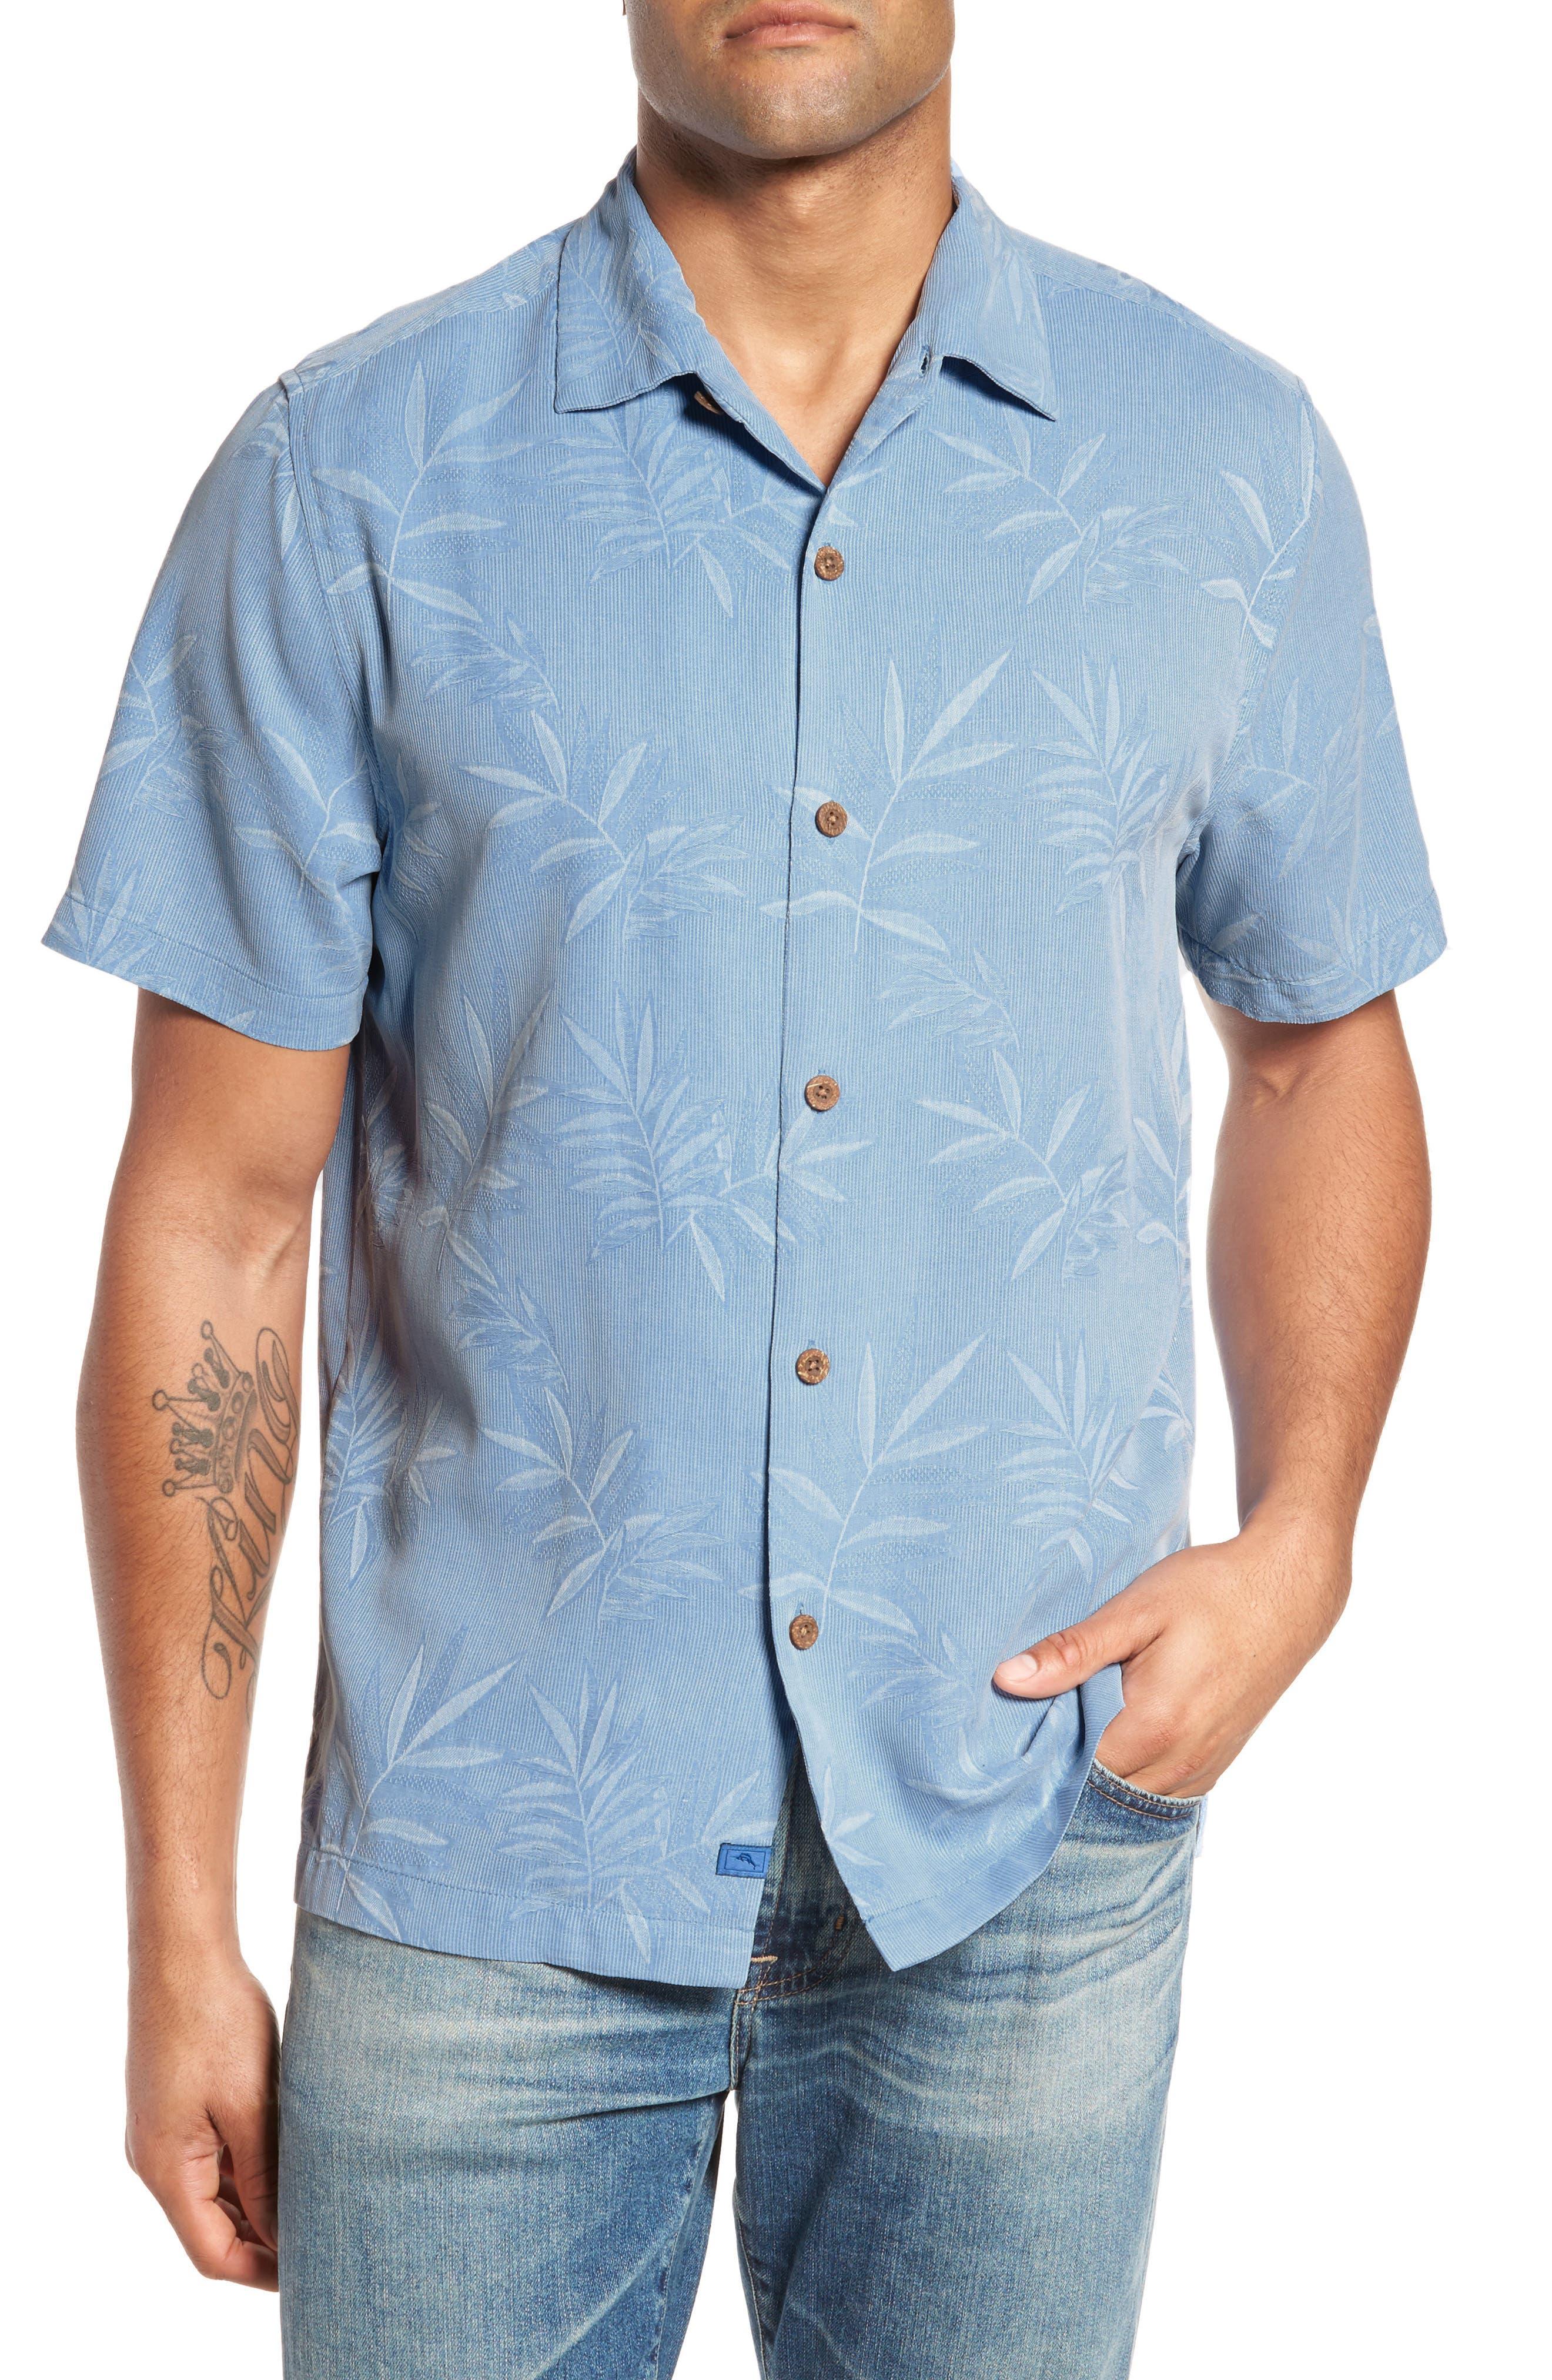 Luau Floral Silk Shirt,                         Main,                         color, LIGHT SKY